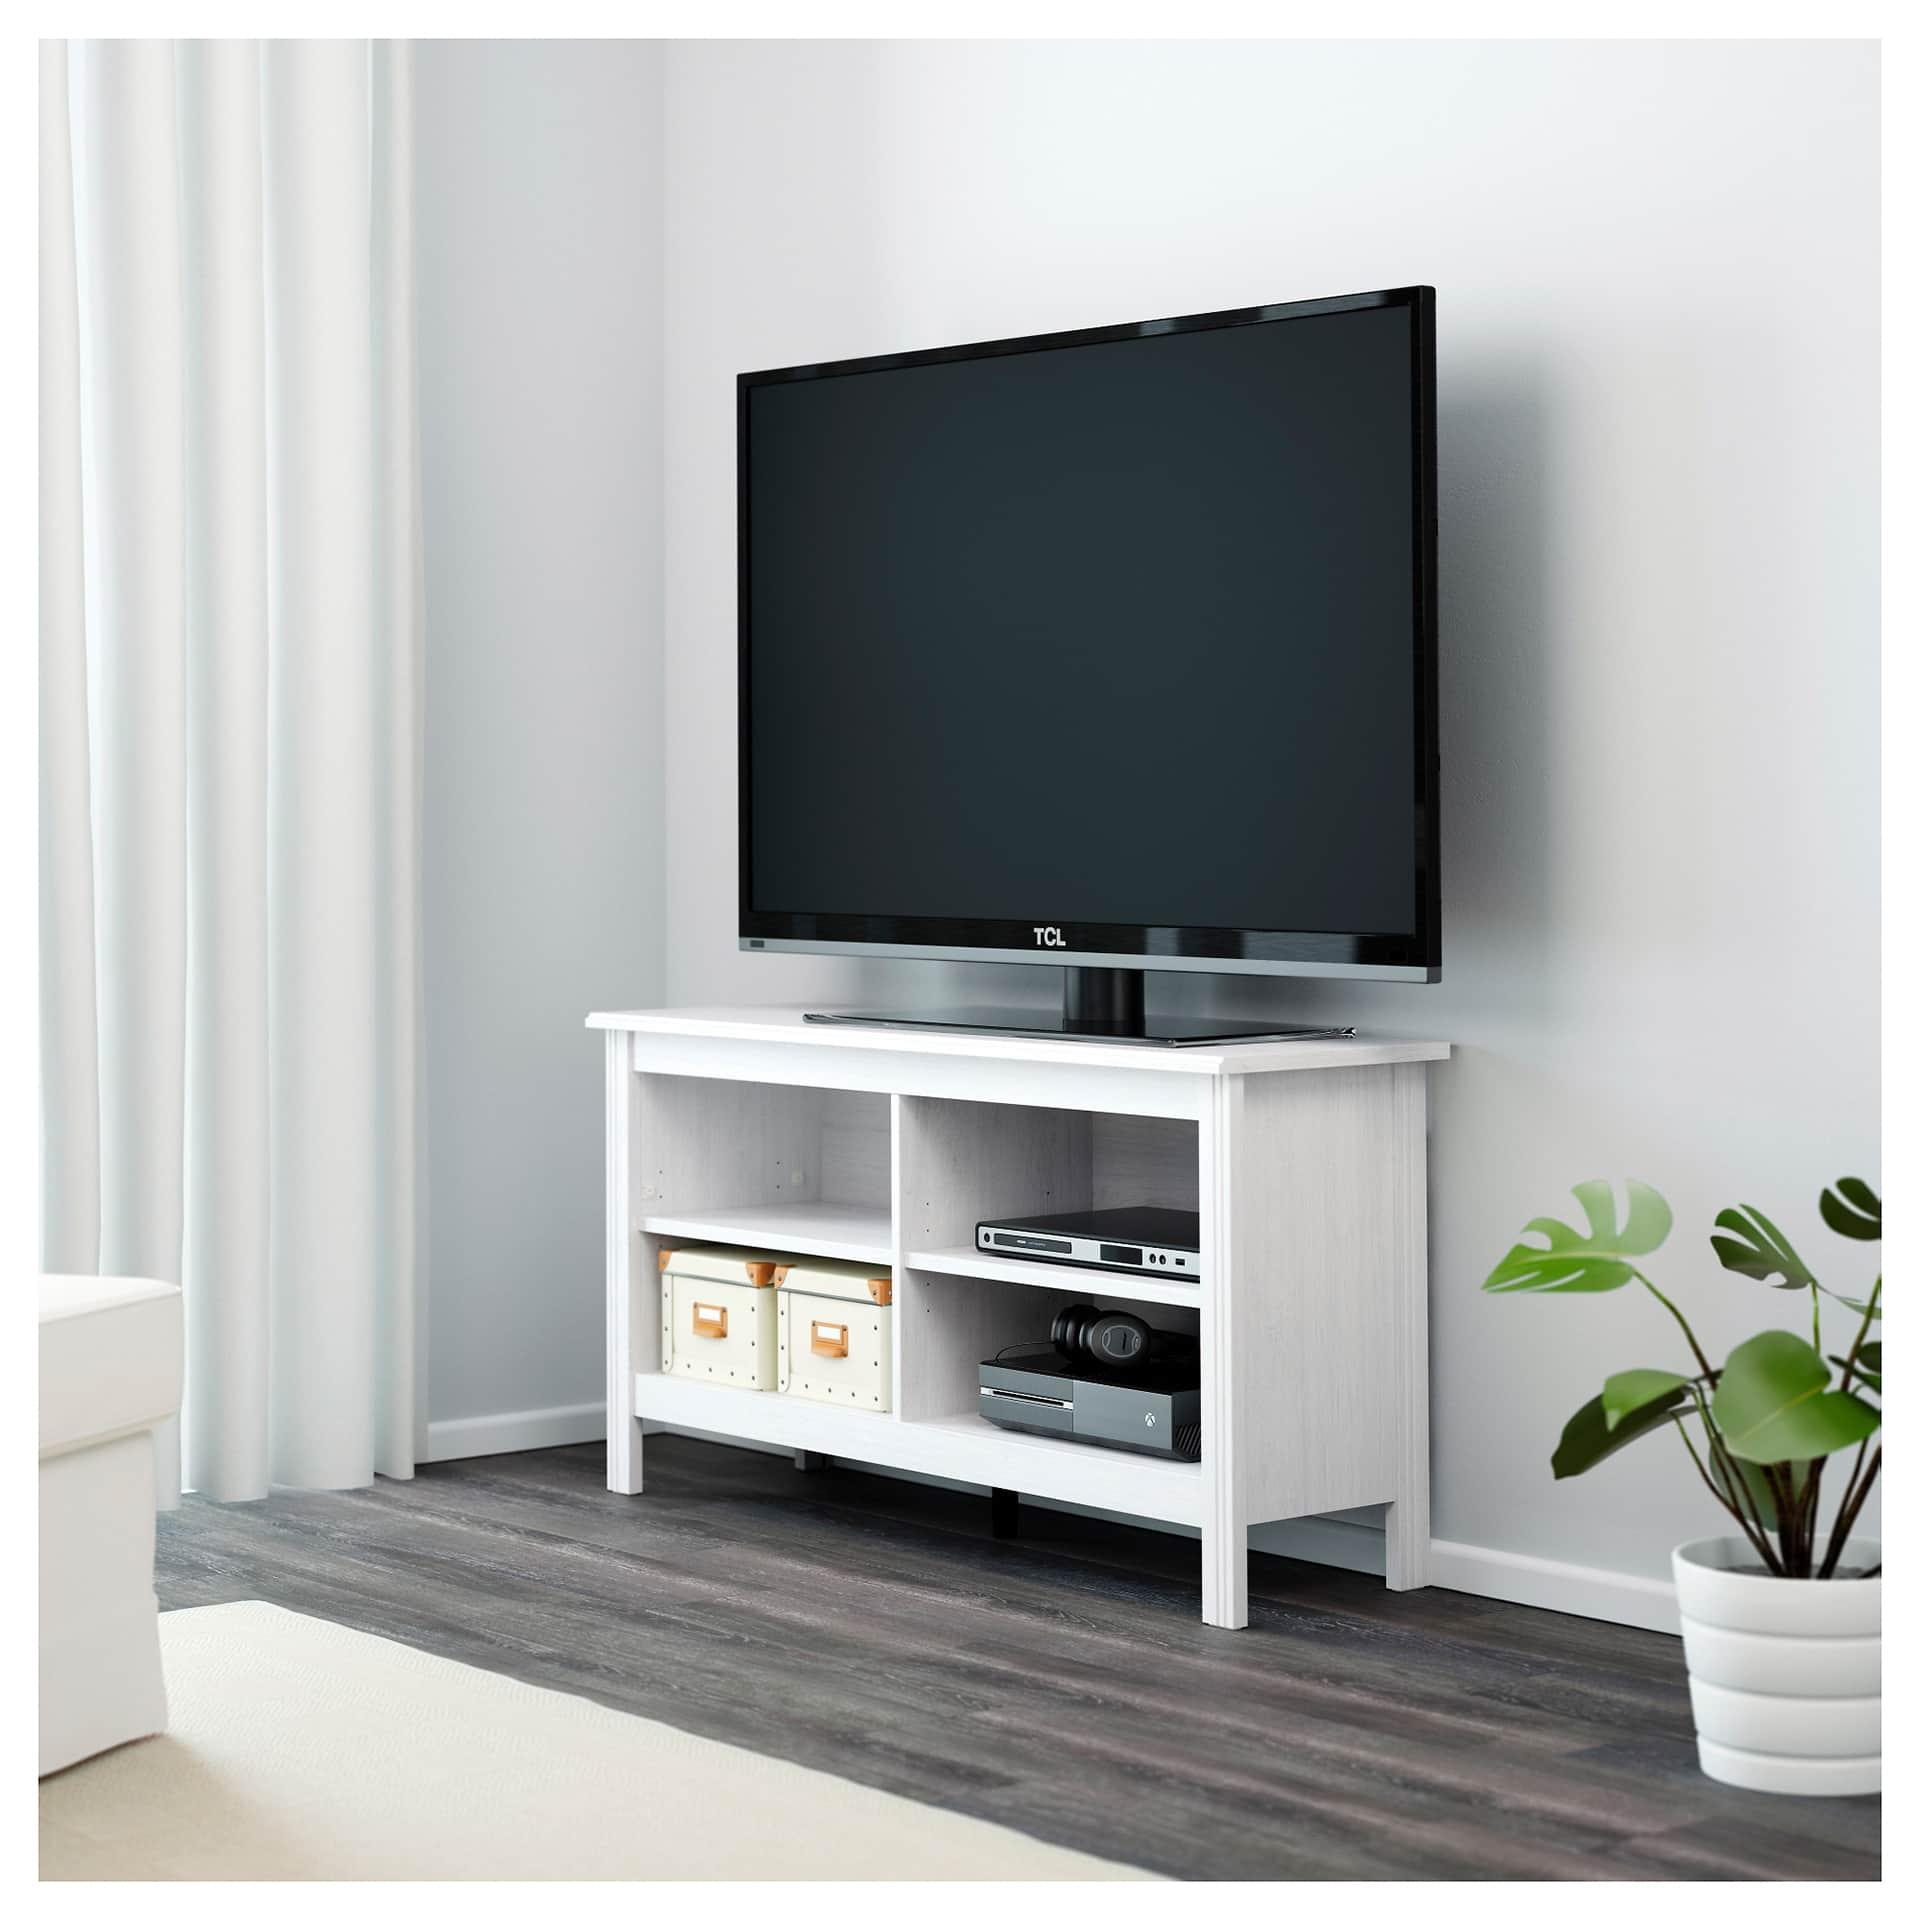 ikea white entertainment unit with TV